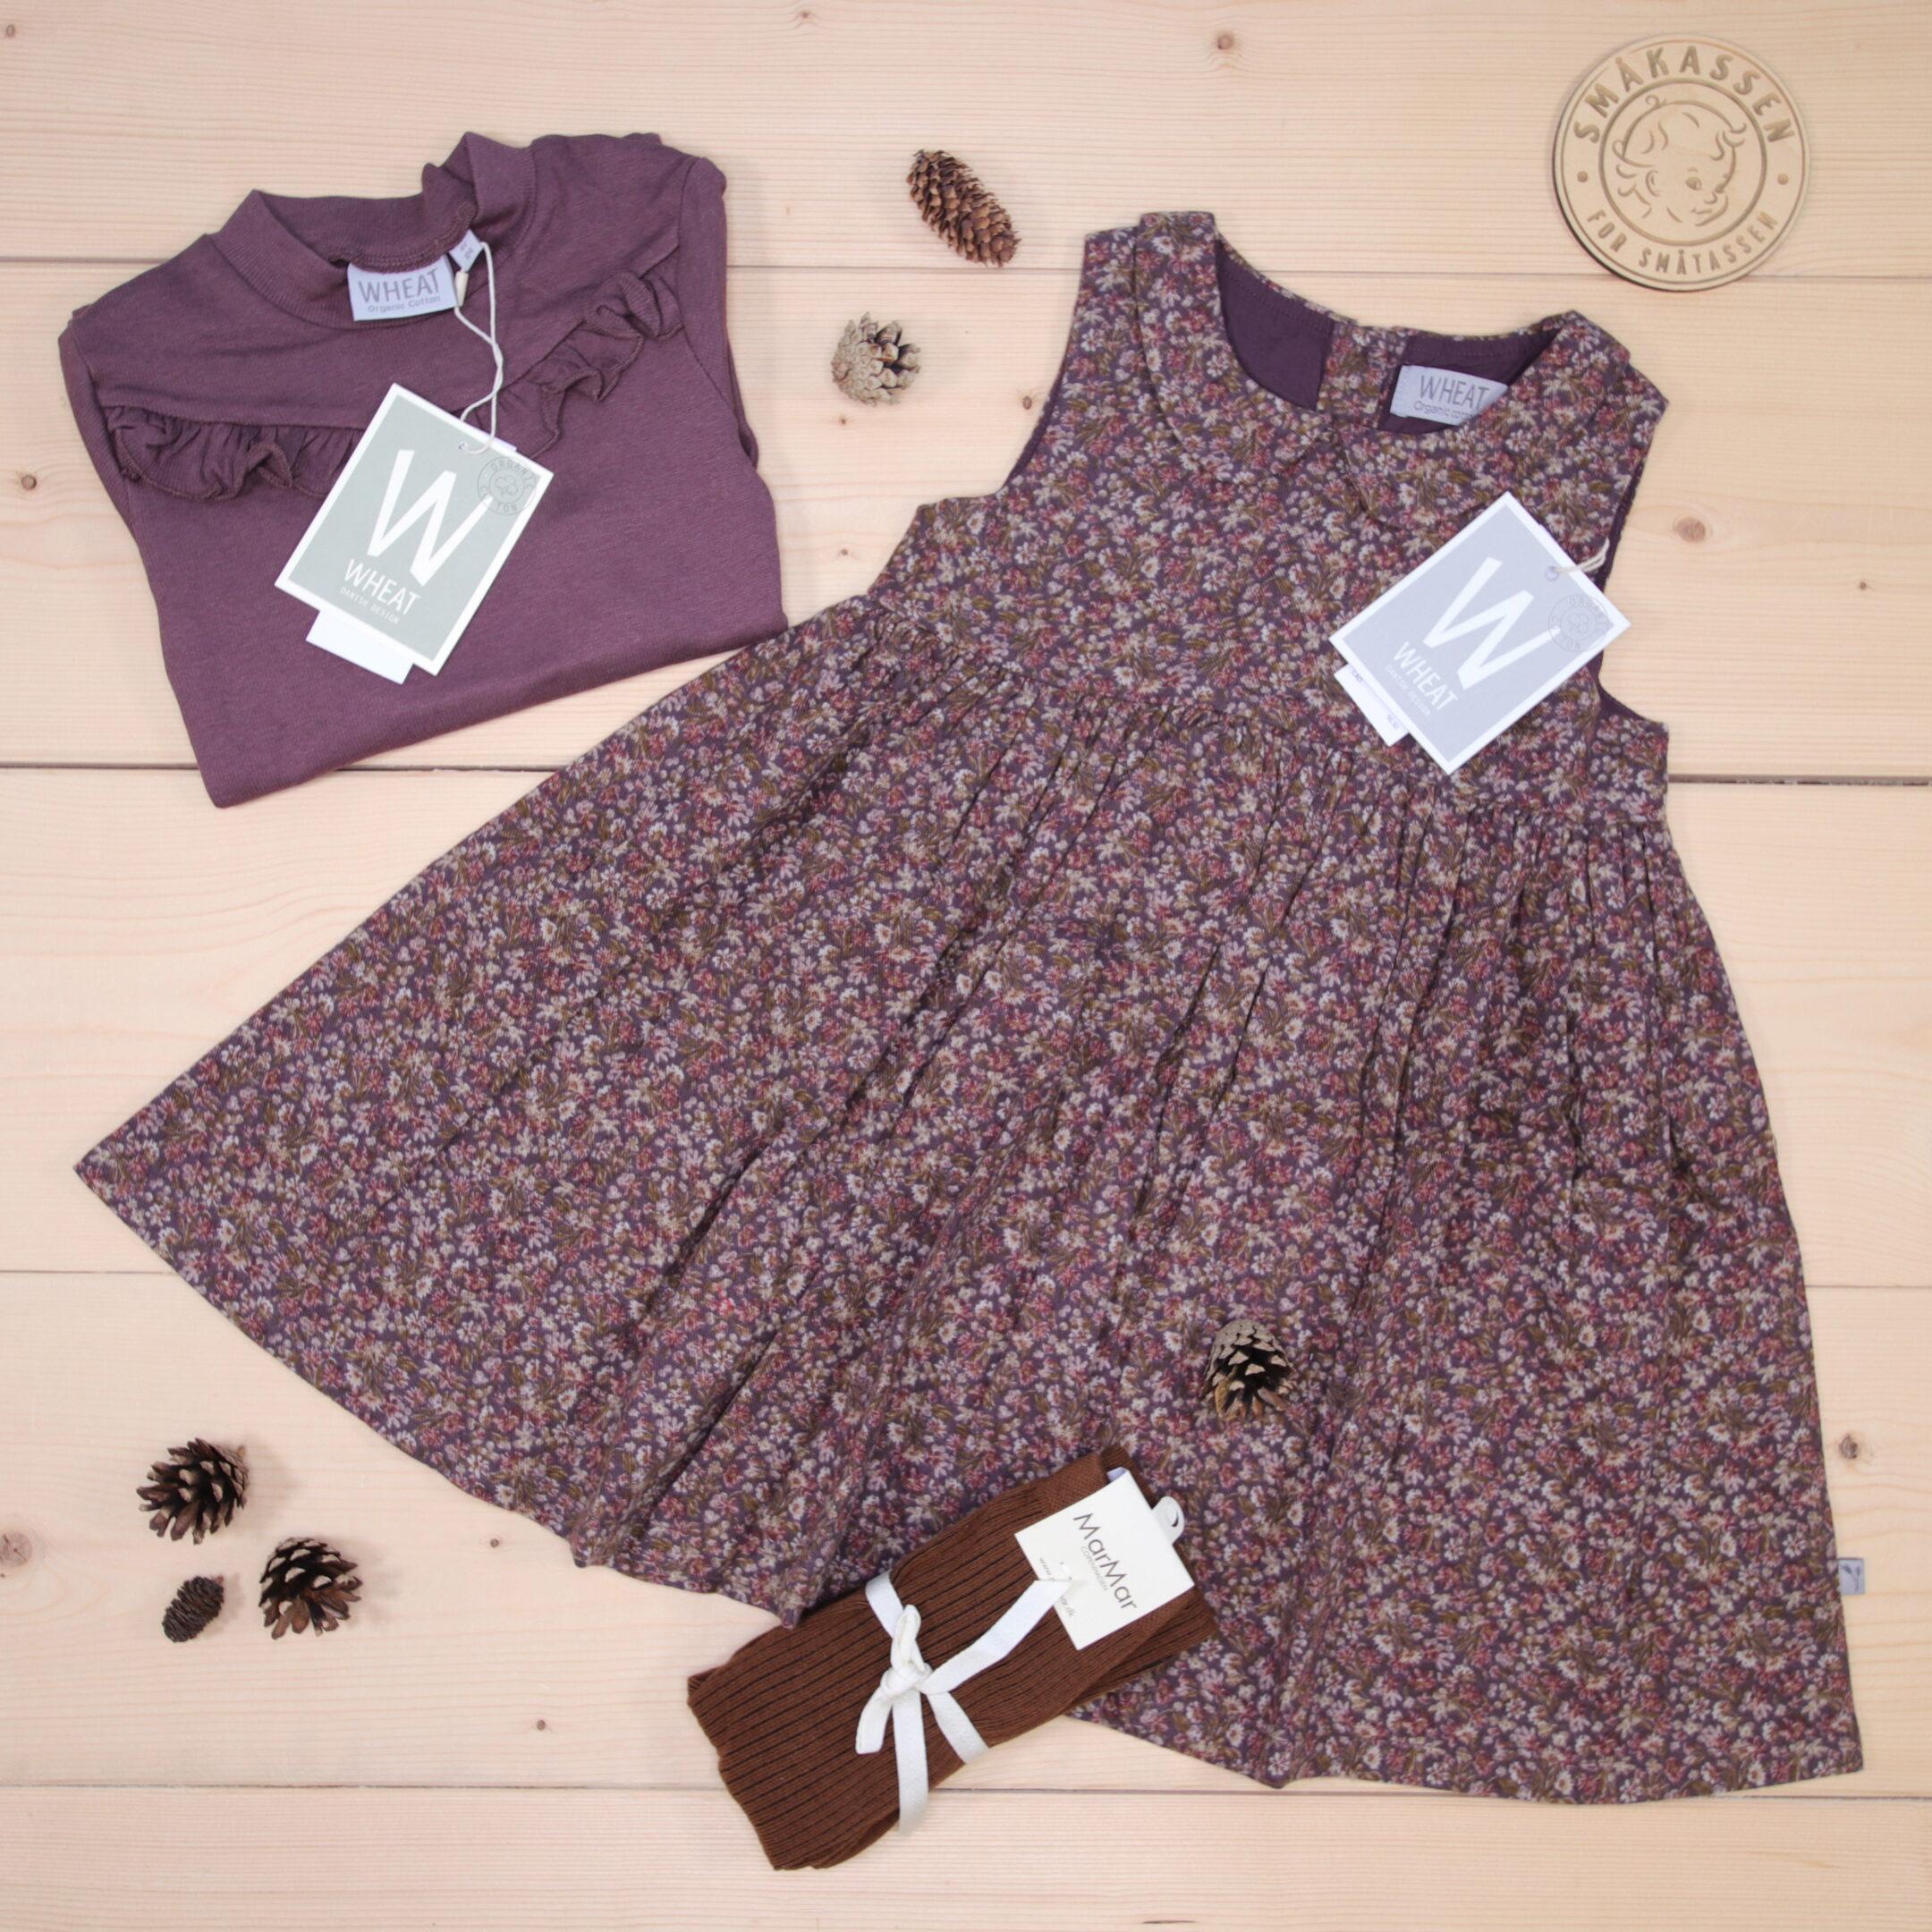 ⭐️NEWS⭐️: Beautiful Eila dress, soft eggplant flowers, and Rib Ruffle t-shirt, soft eggplant, from Wheat 🍁🎀  #Wheat #AW20     Dette er Småpakke som vi forberedte for en jente i stilene cute og cool